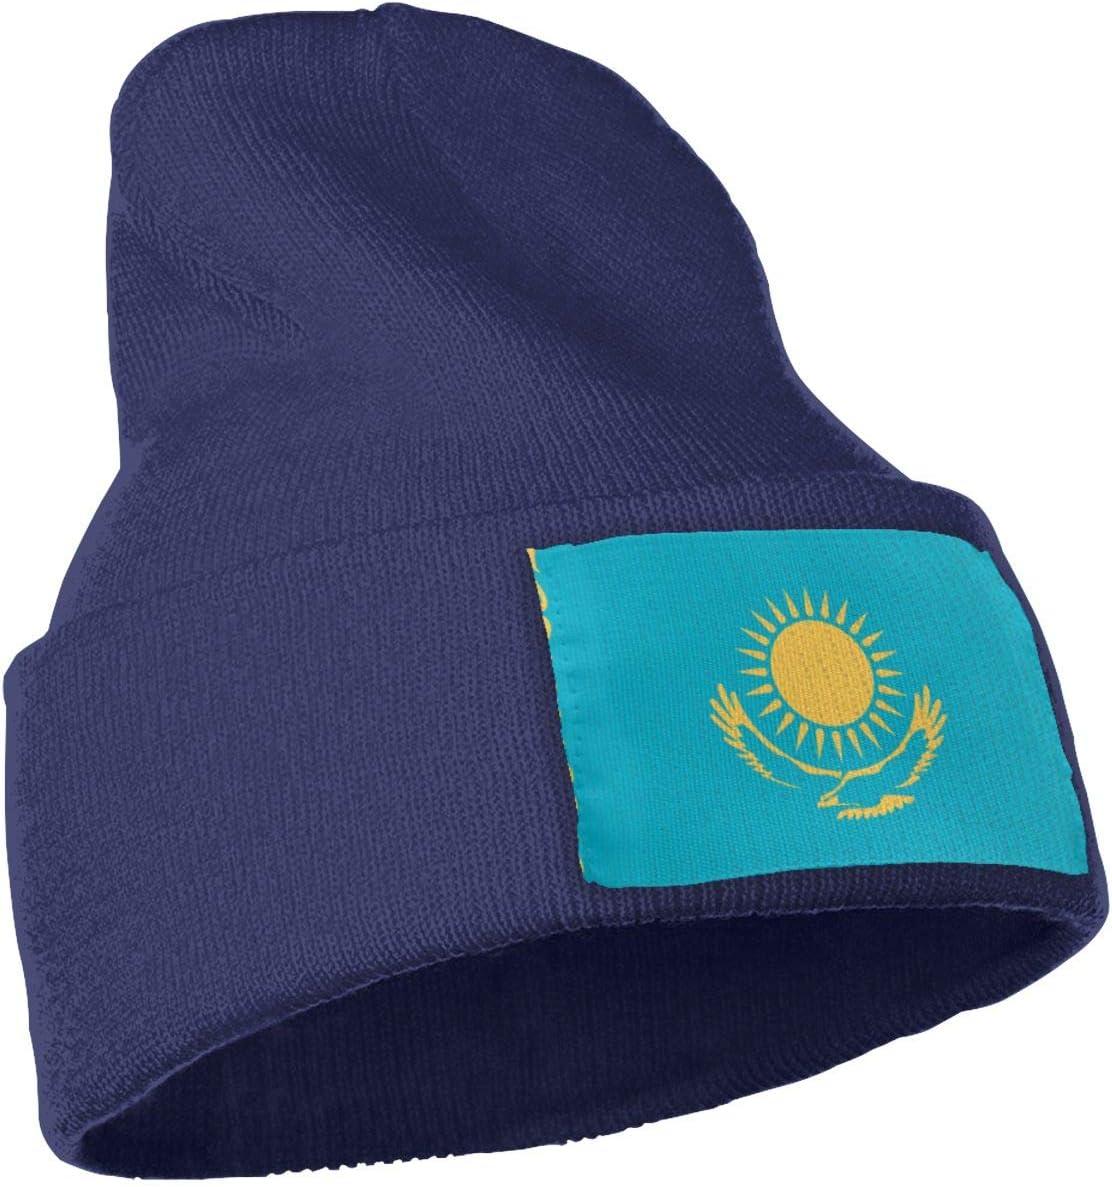 Warm /& Stylish Winter Hats Black Thick MACA Kazakhstan Unisex Slouch Beanie Hats